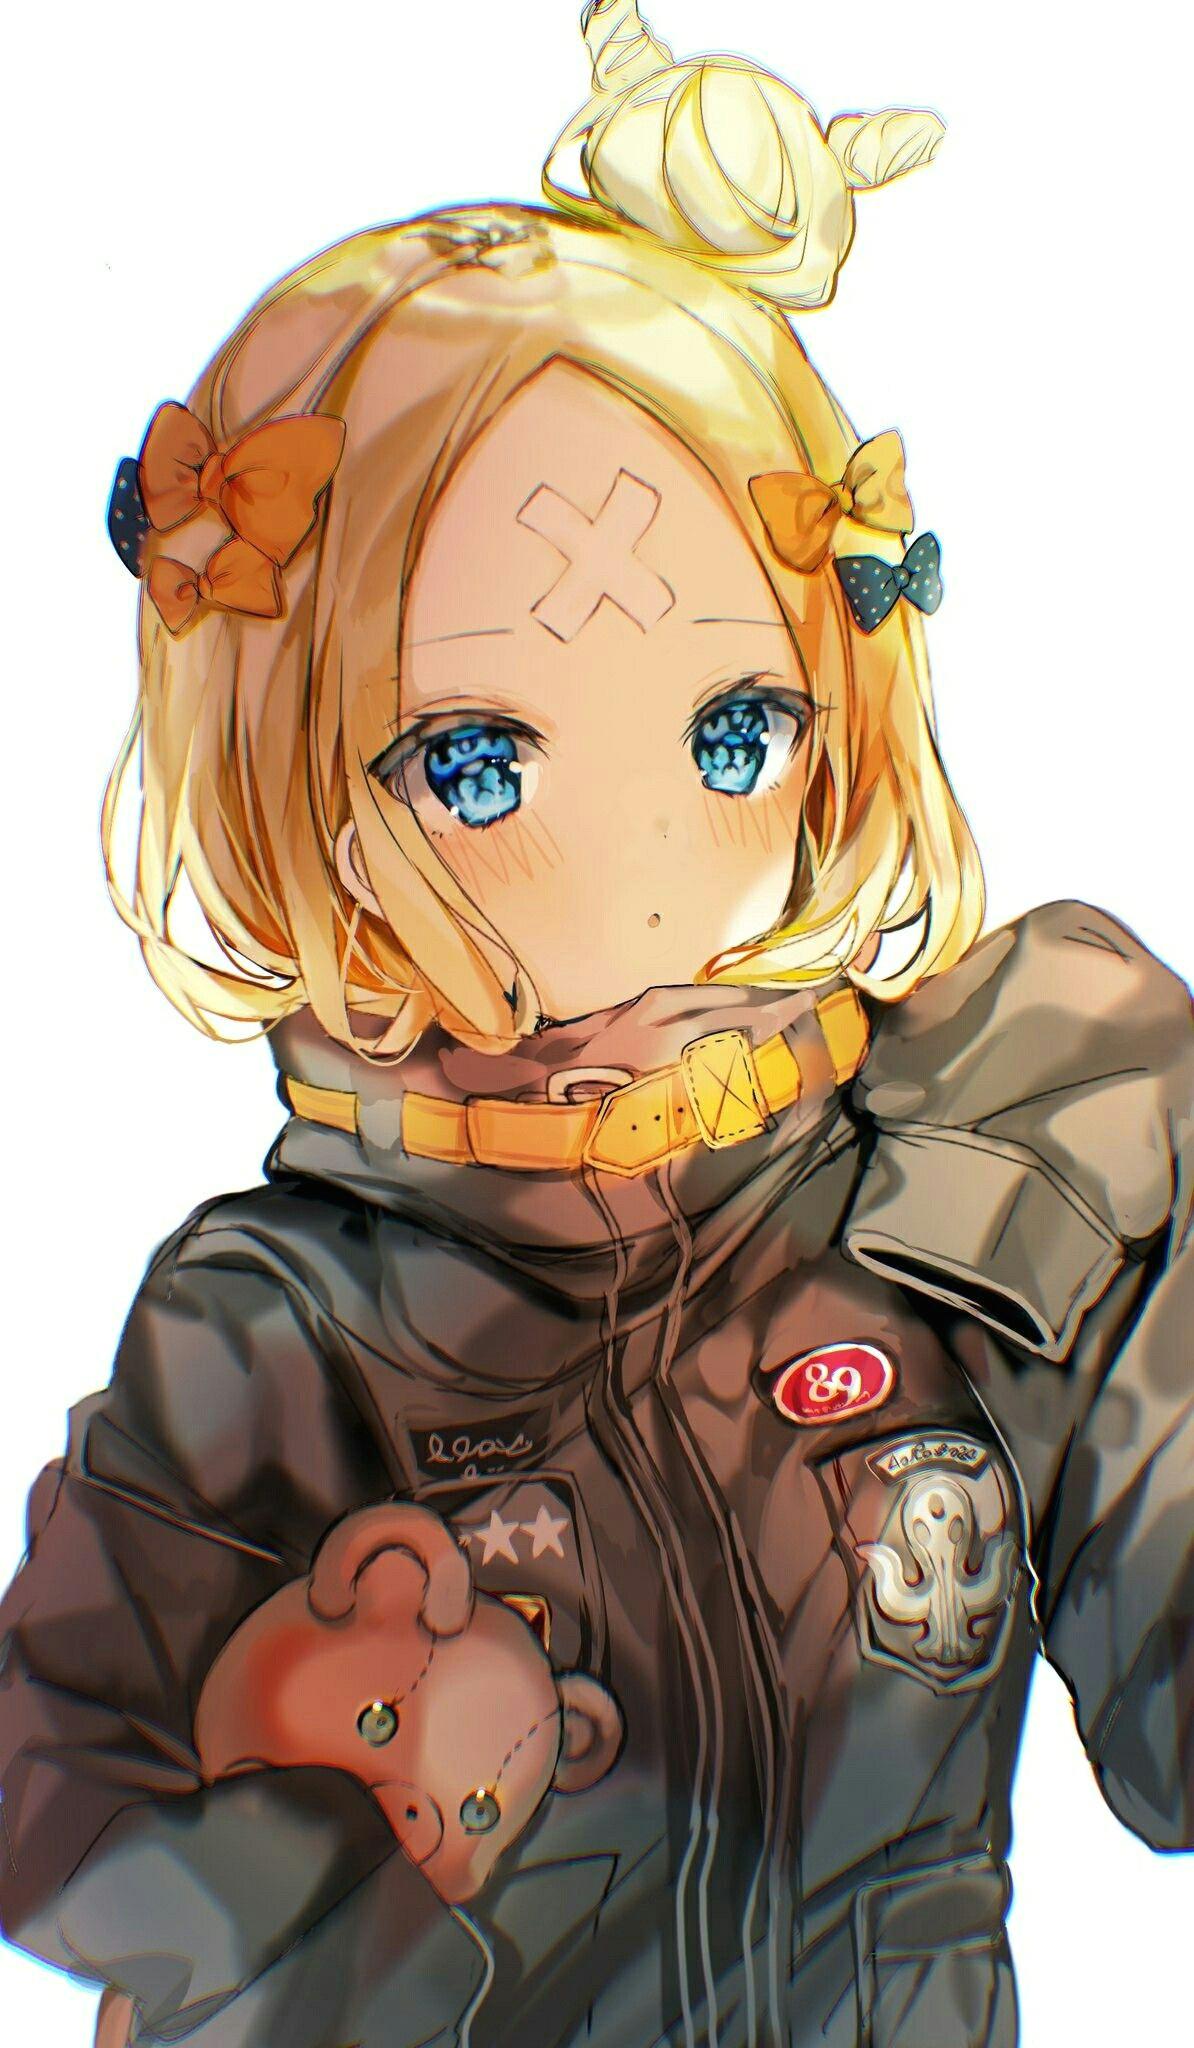 abigail kawaii anime girl anime girls anime group i love anime art